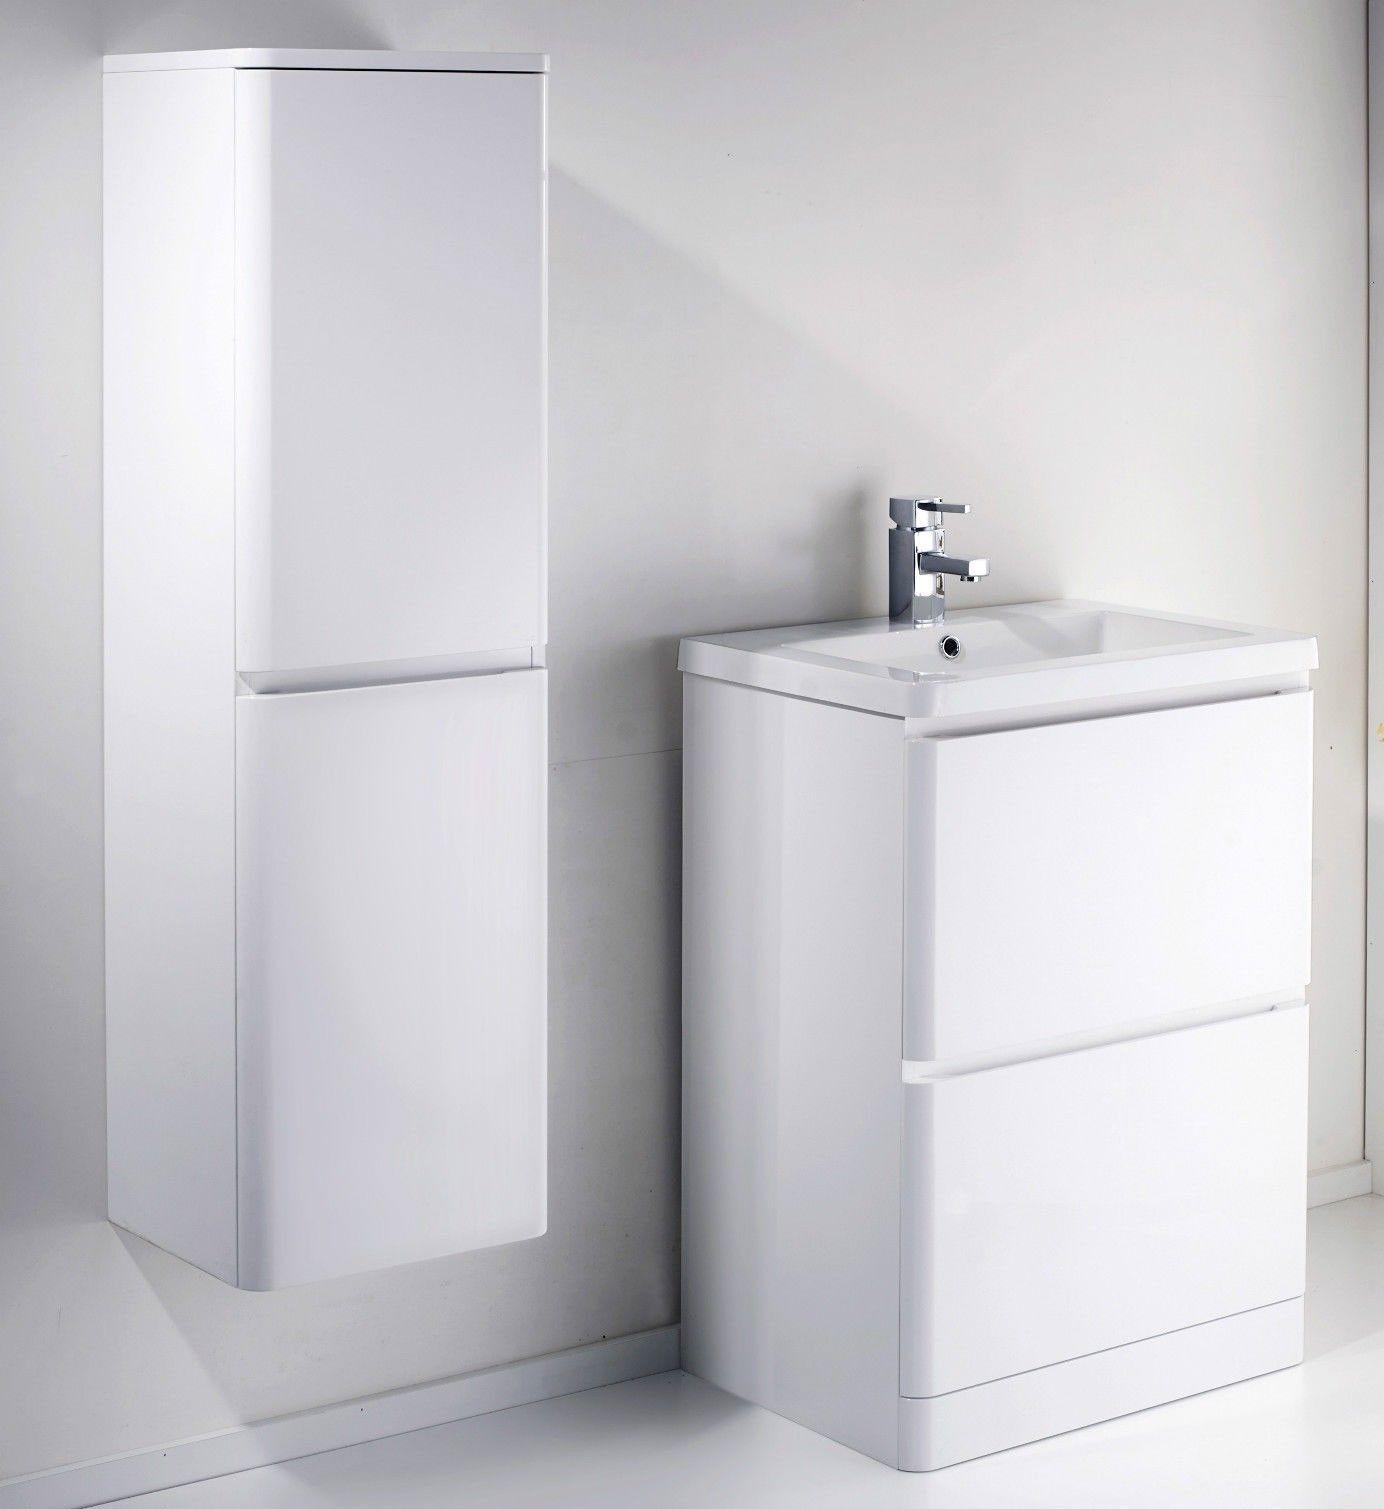 Cove Bathroom Furniture Pack 5 Piece White Gloss Victorian Plumbing Uk Bathroom Furniture Uk White Bathroom Furniture Bathroom Furniture Storage